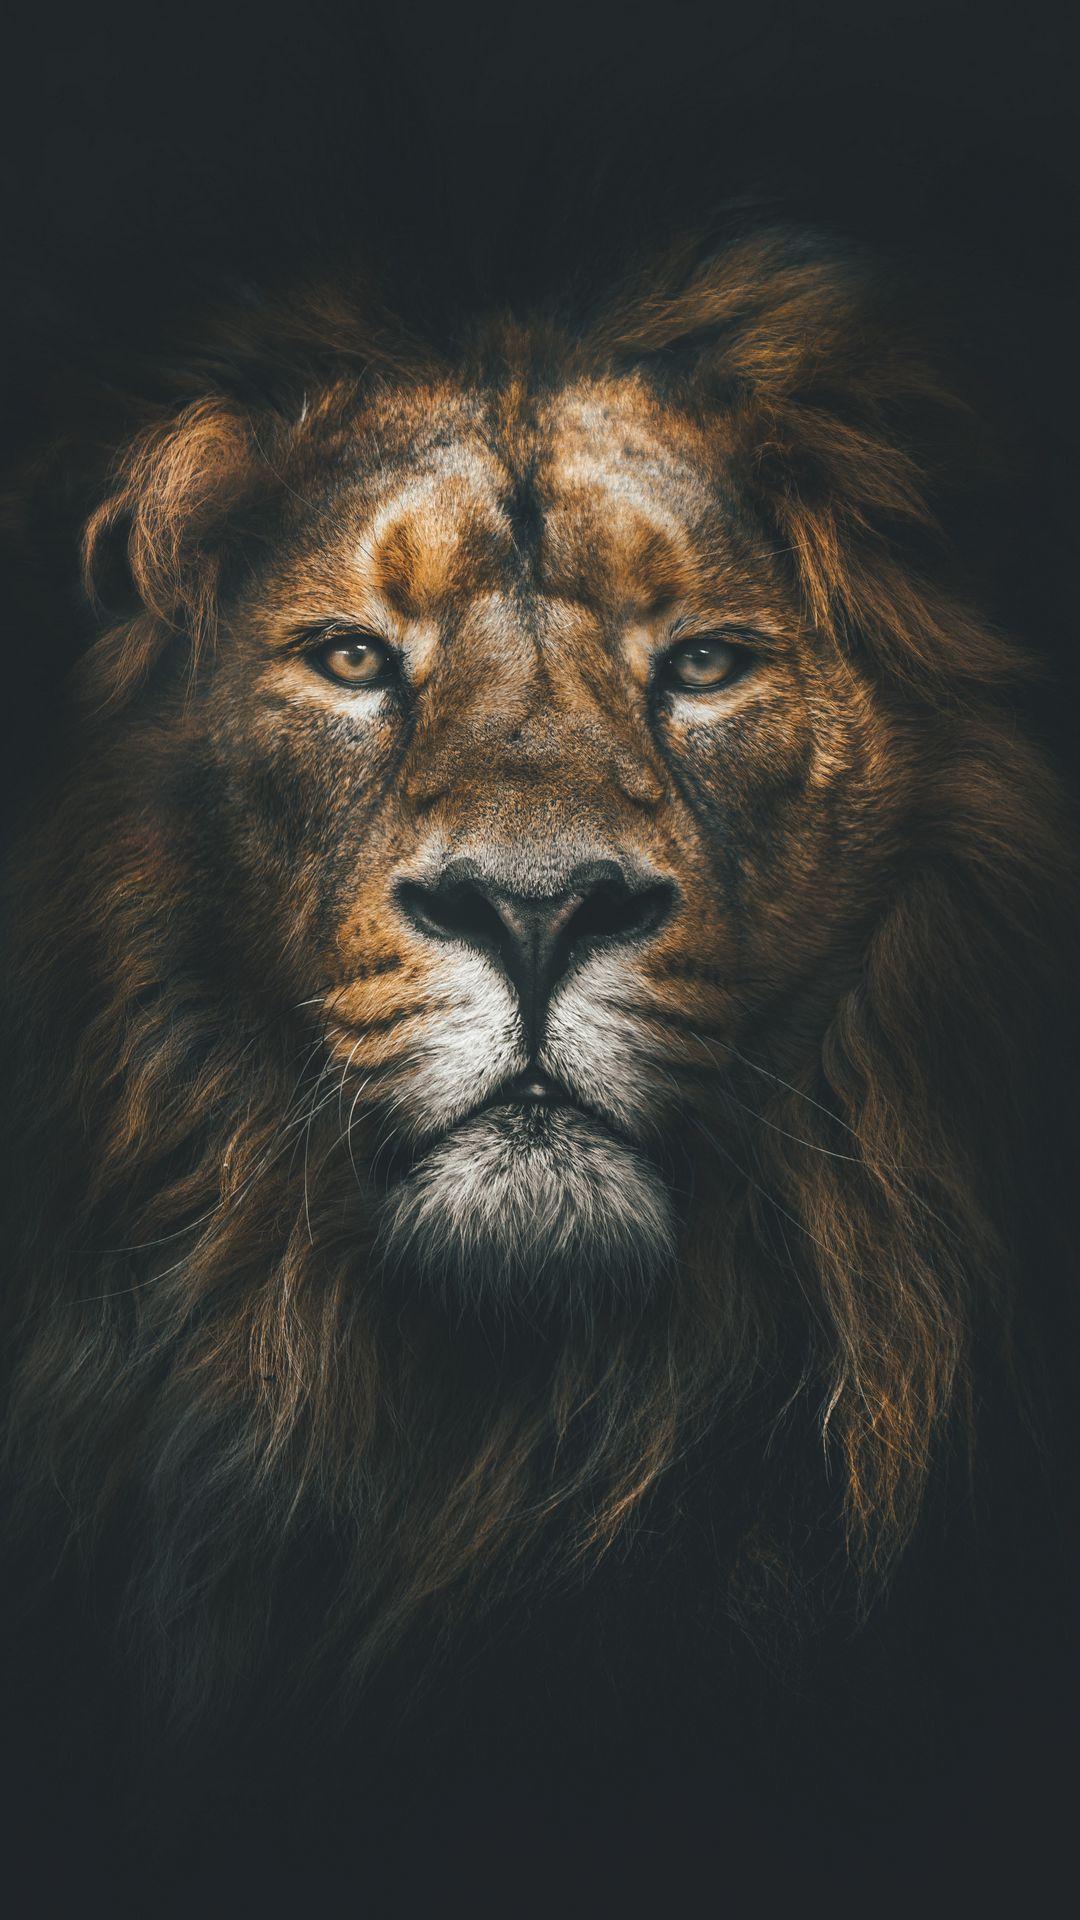 1080x1920 Wallpaper lion, muzzle, mane, loок, predator